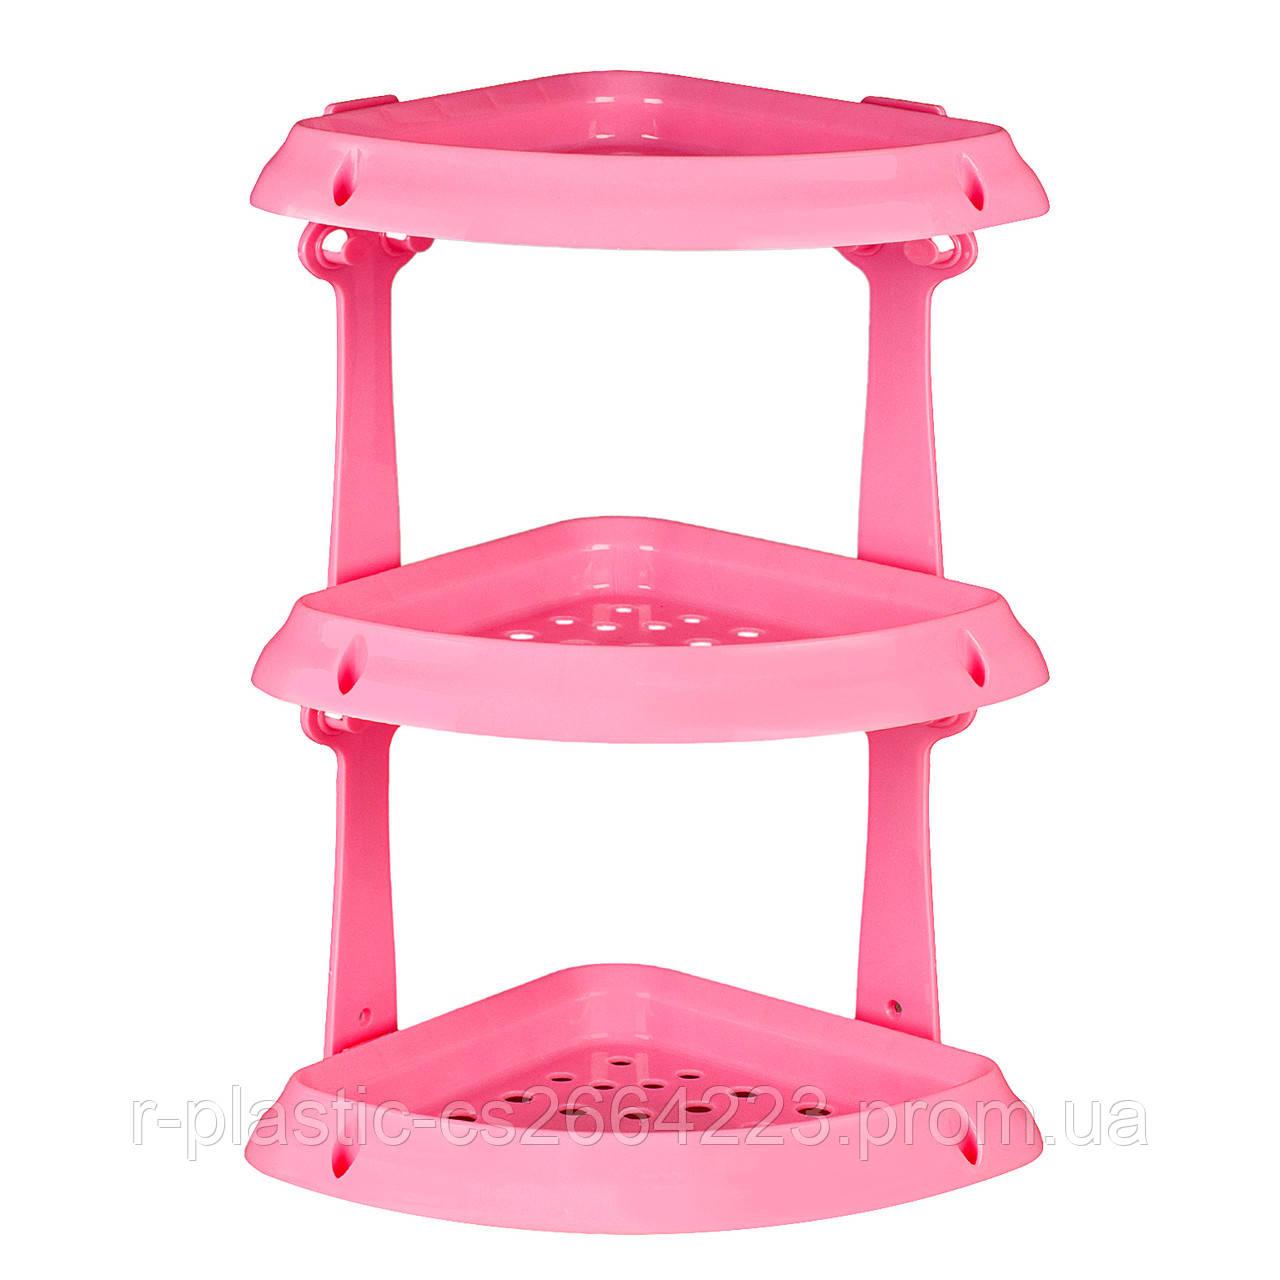 Полка R-Plastic угловая 3 яруса в ванную комнату розовая